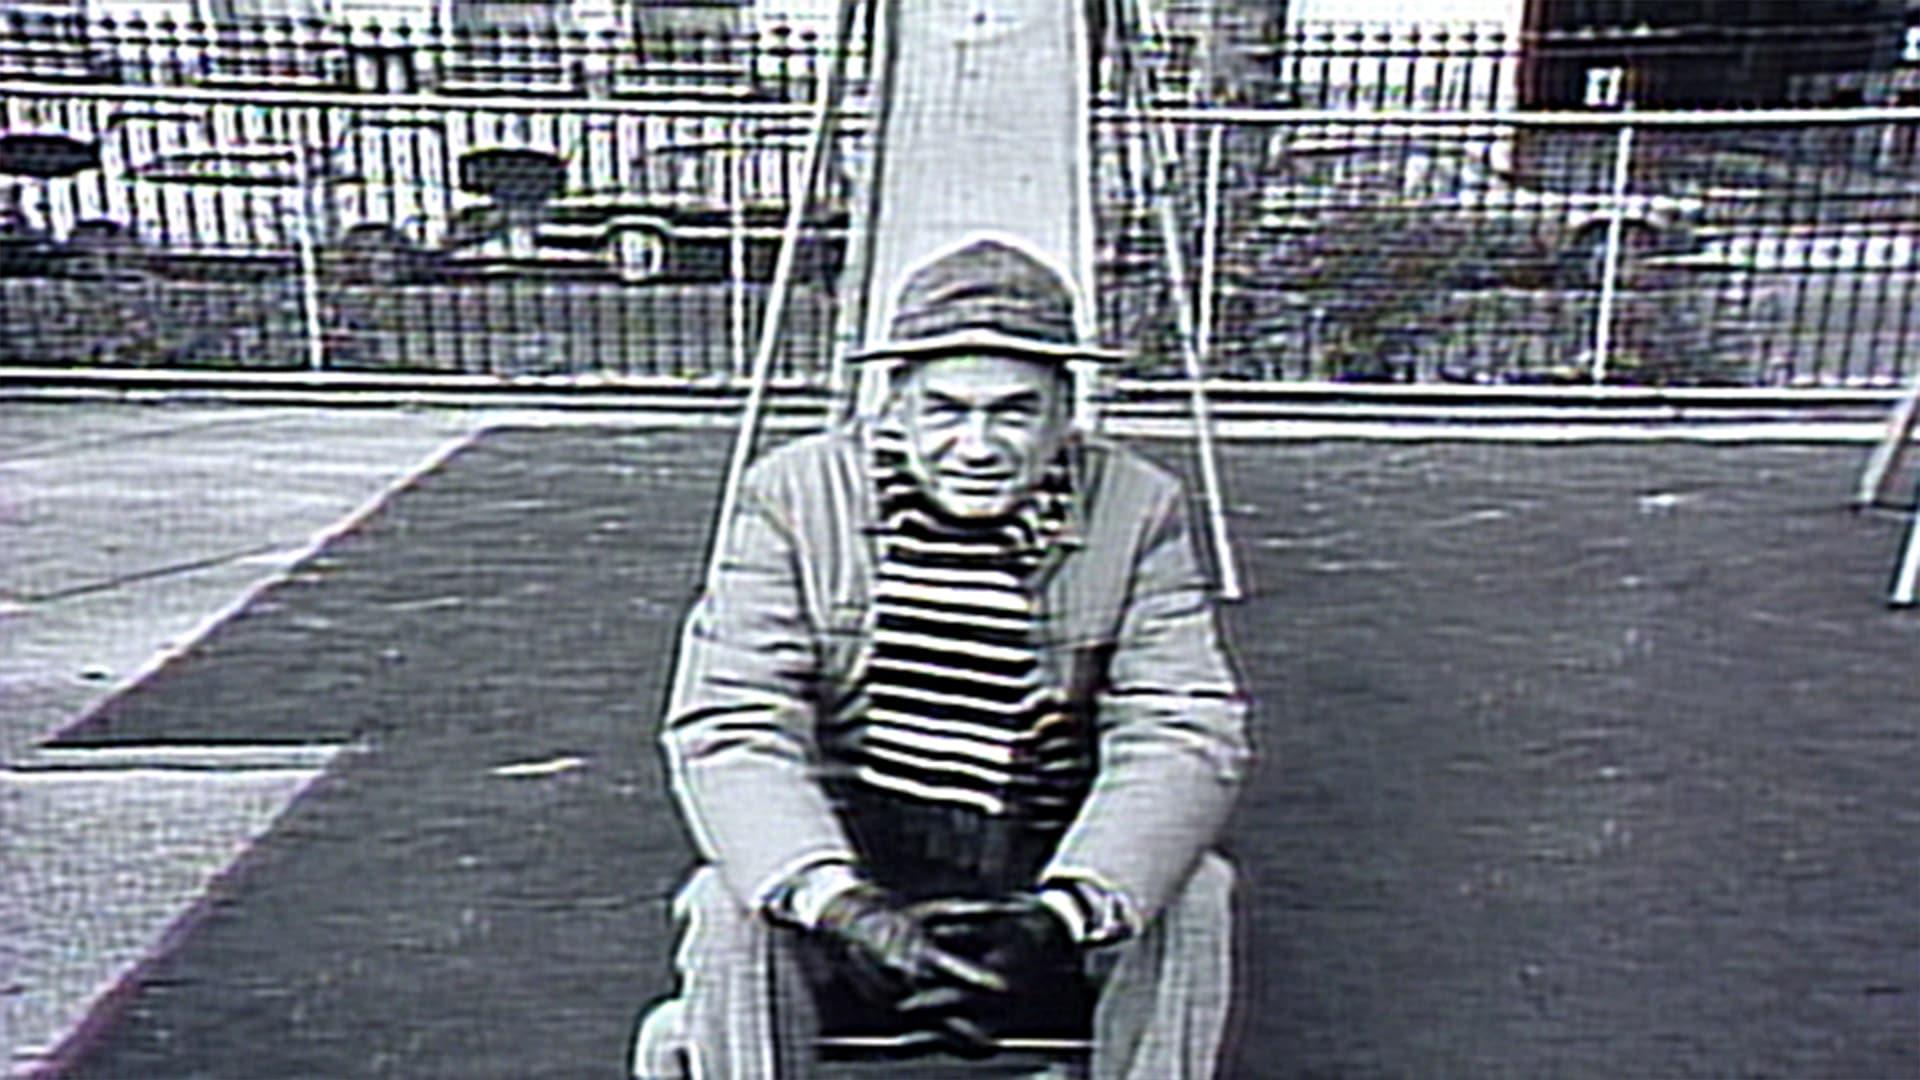 Edwin Newman: February 25, 1984